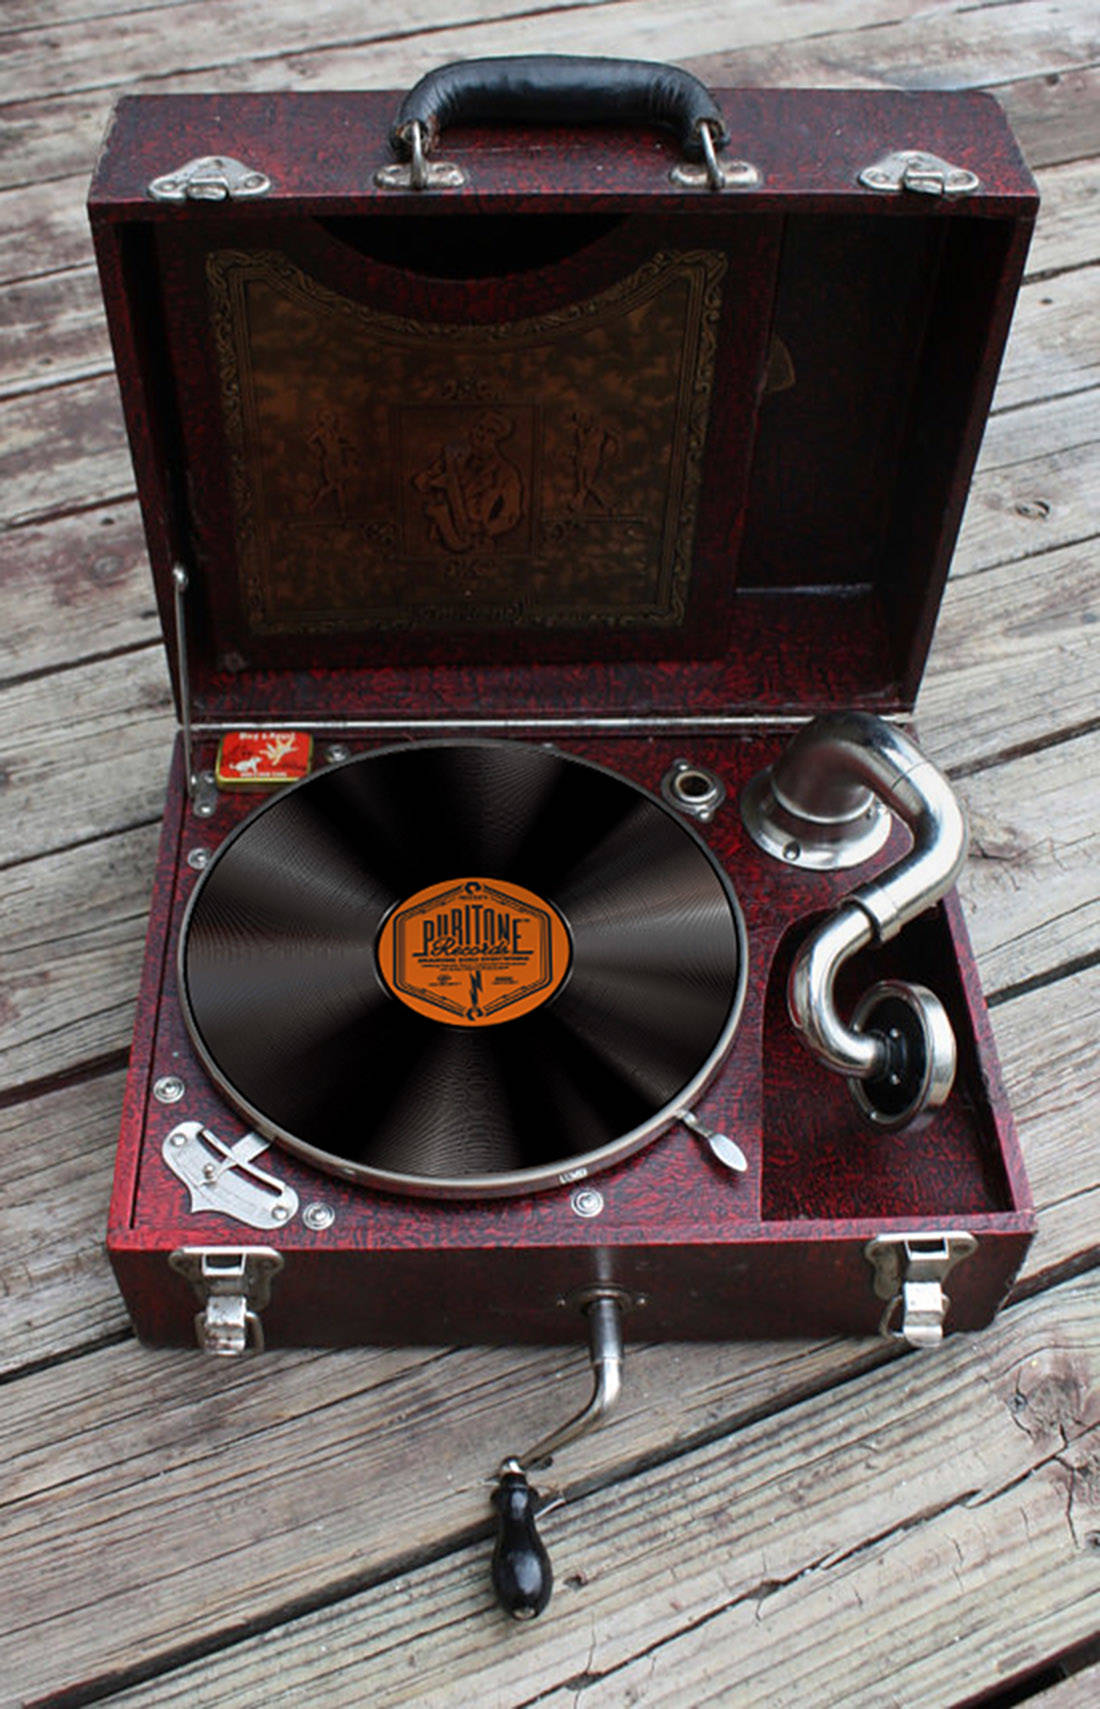 PURITONE Portable Phonograph Gramophone Record Player